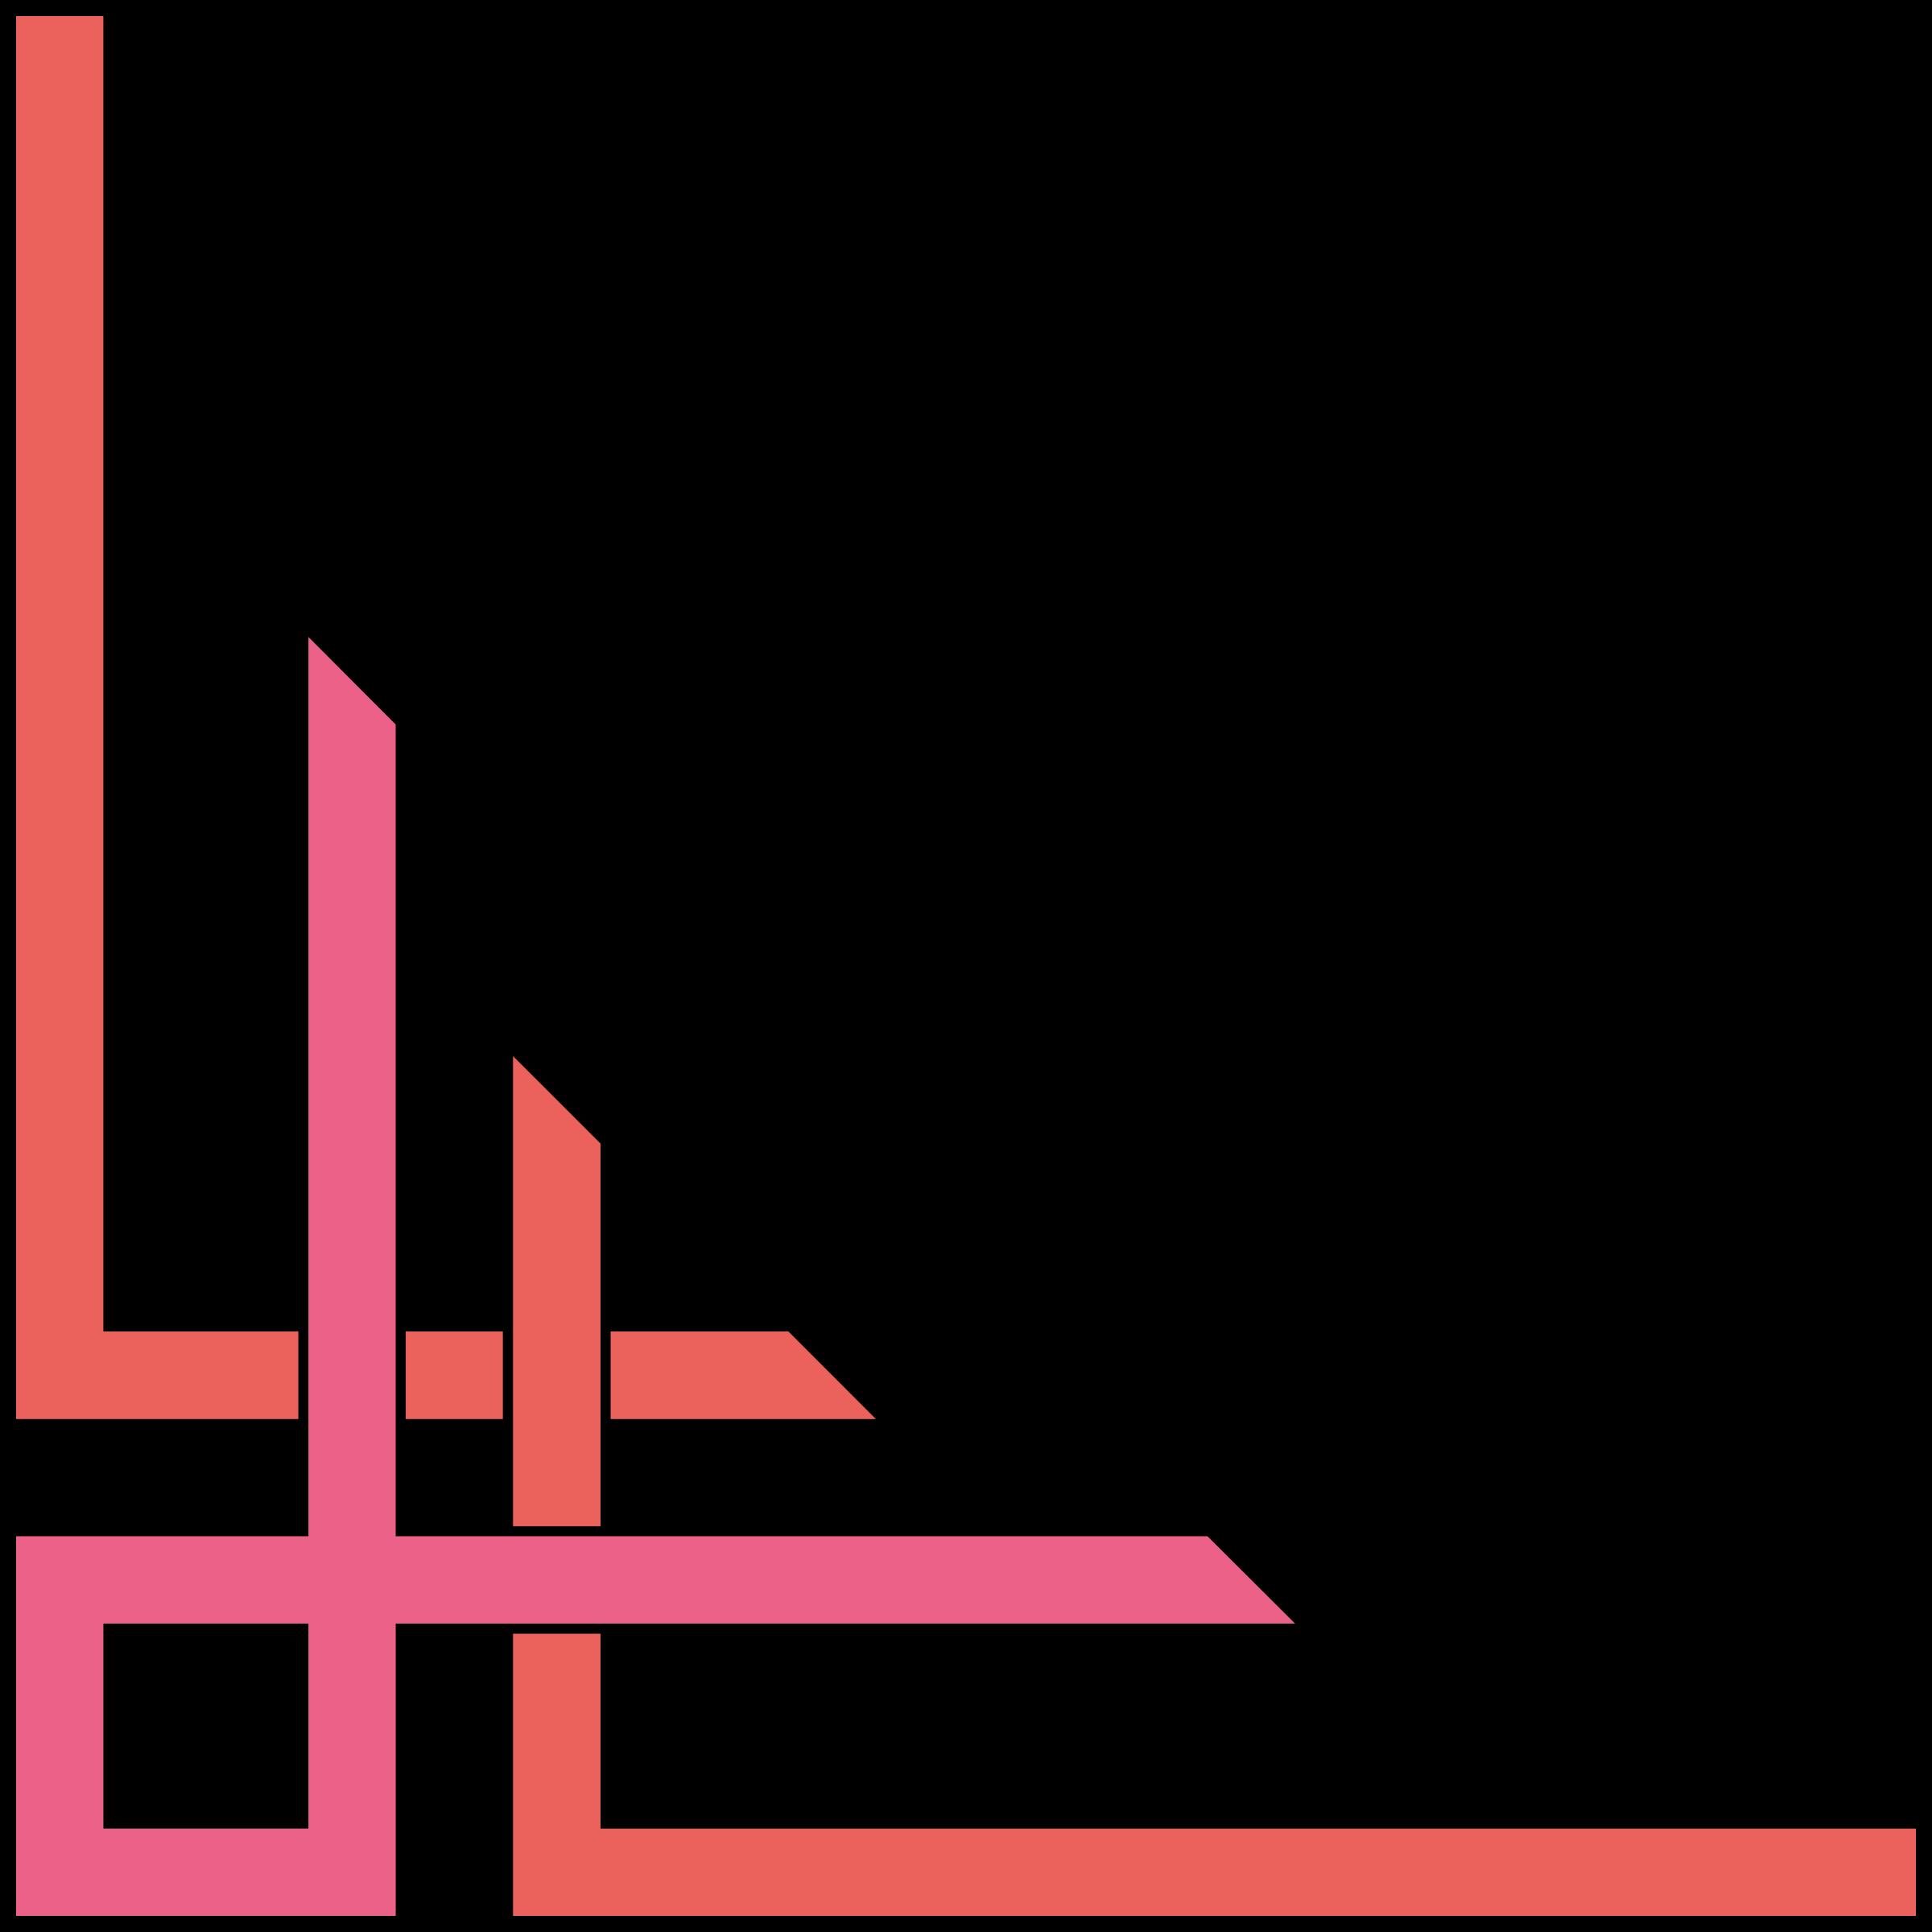 shapes clipart corner